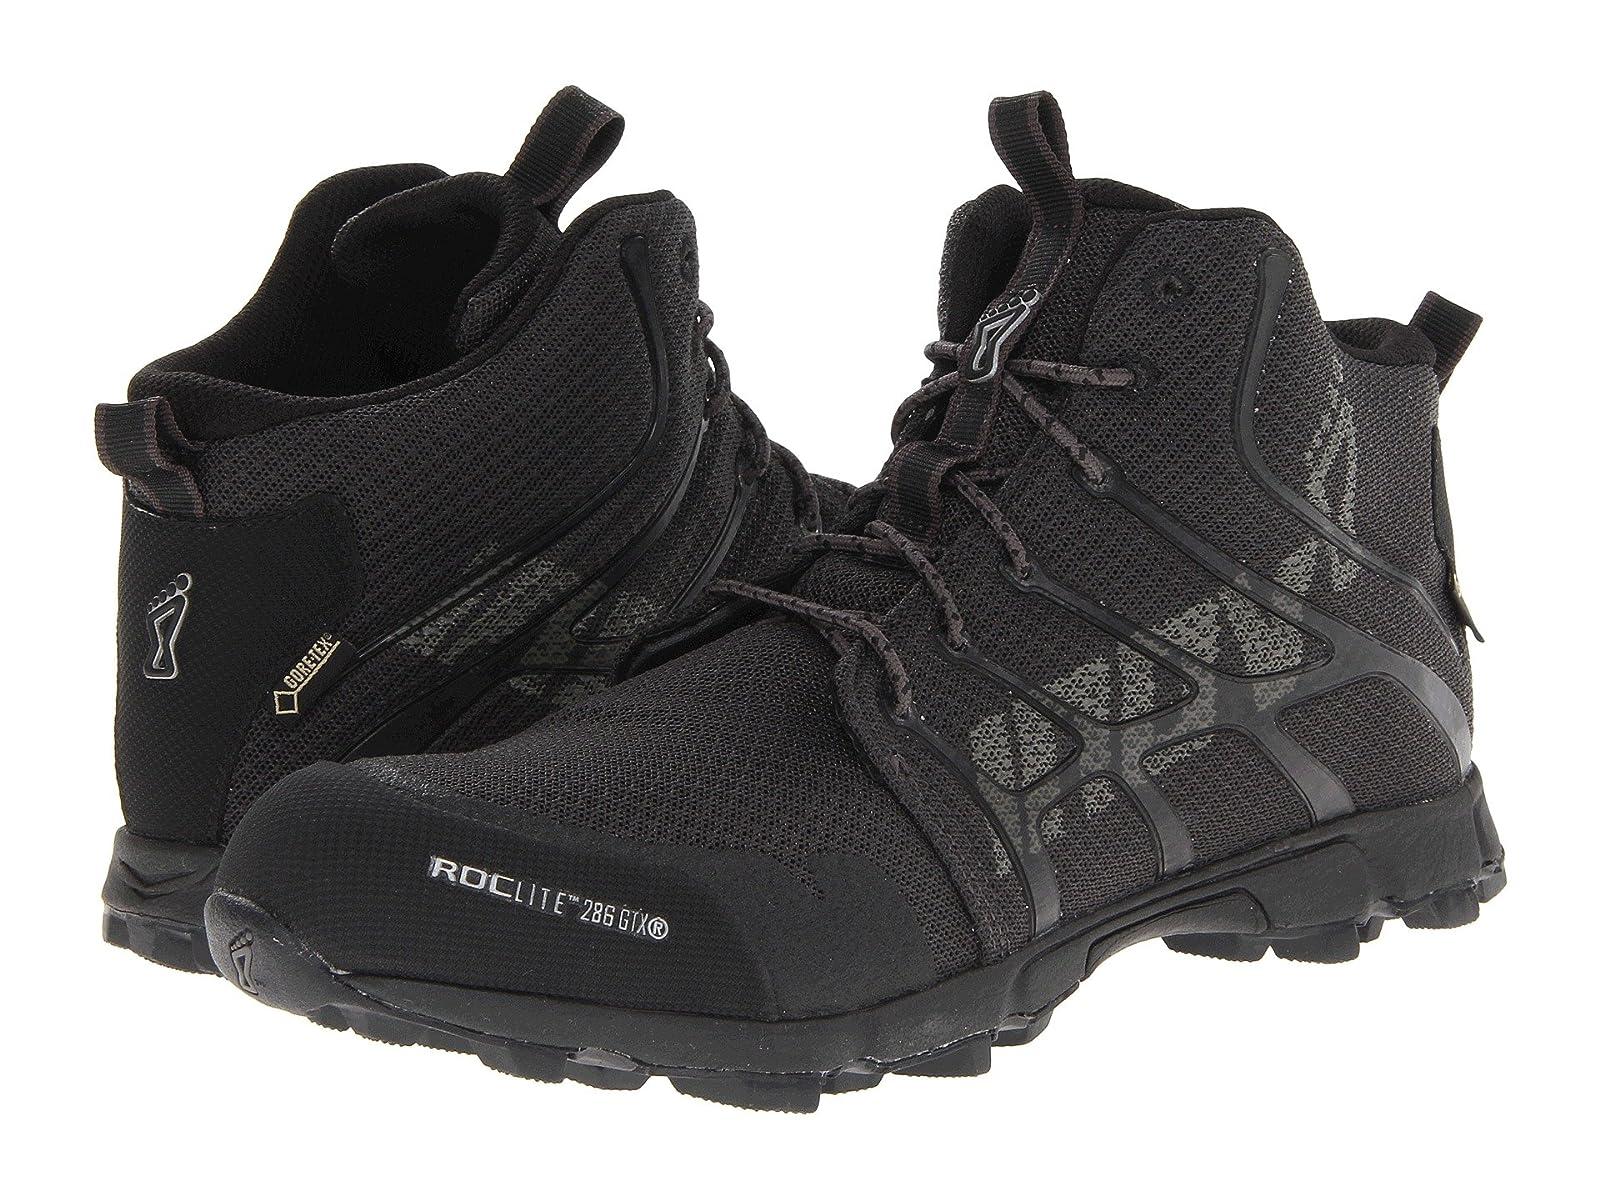 inov-8 Roclite™ 286 GTX®Cheap and distinctive eye-catching shoes